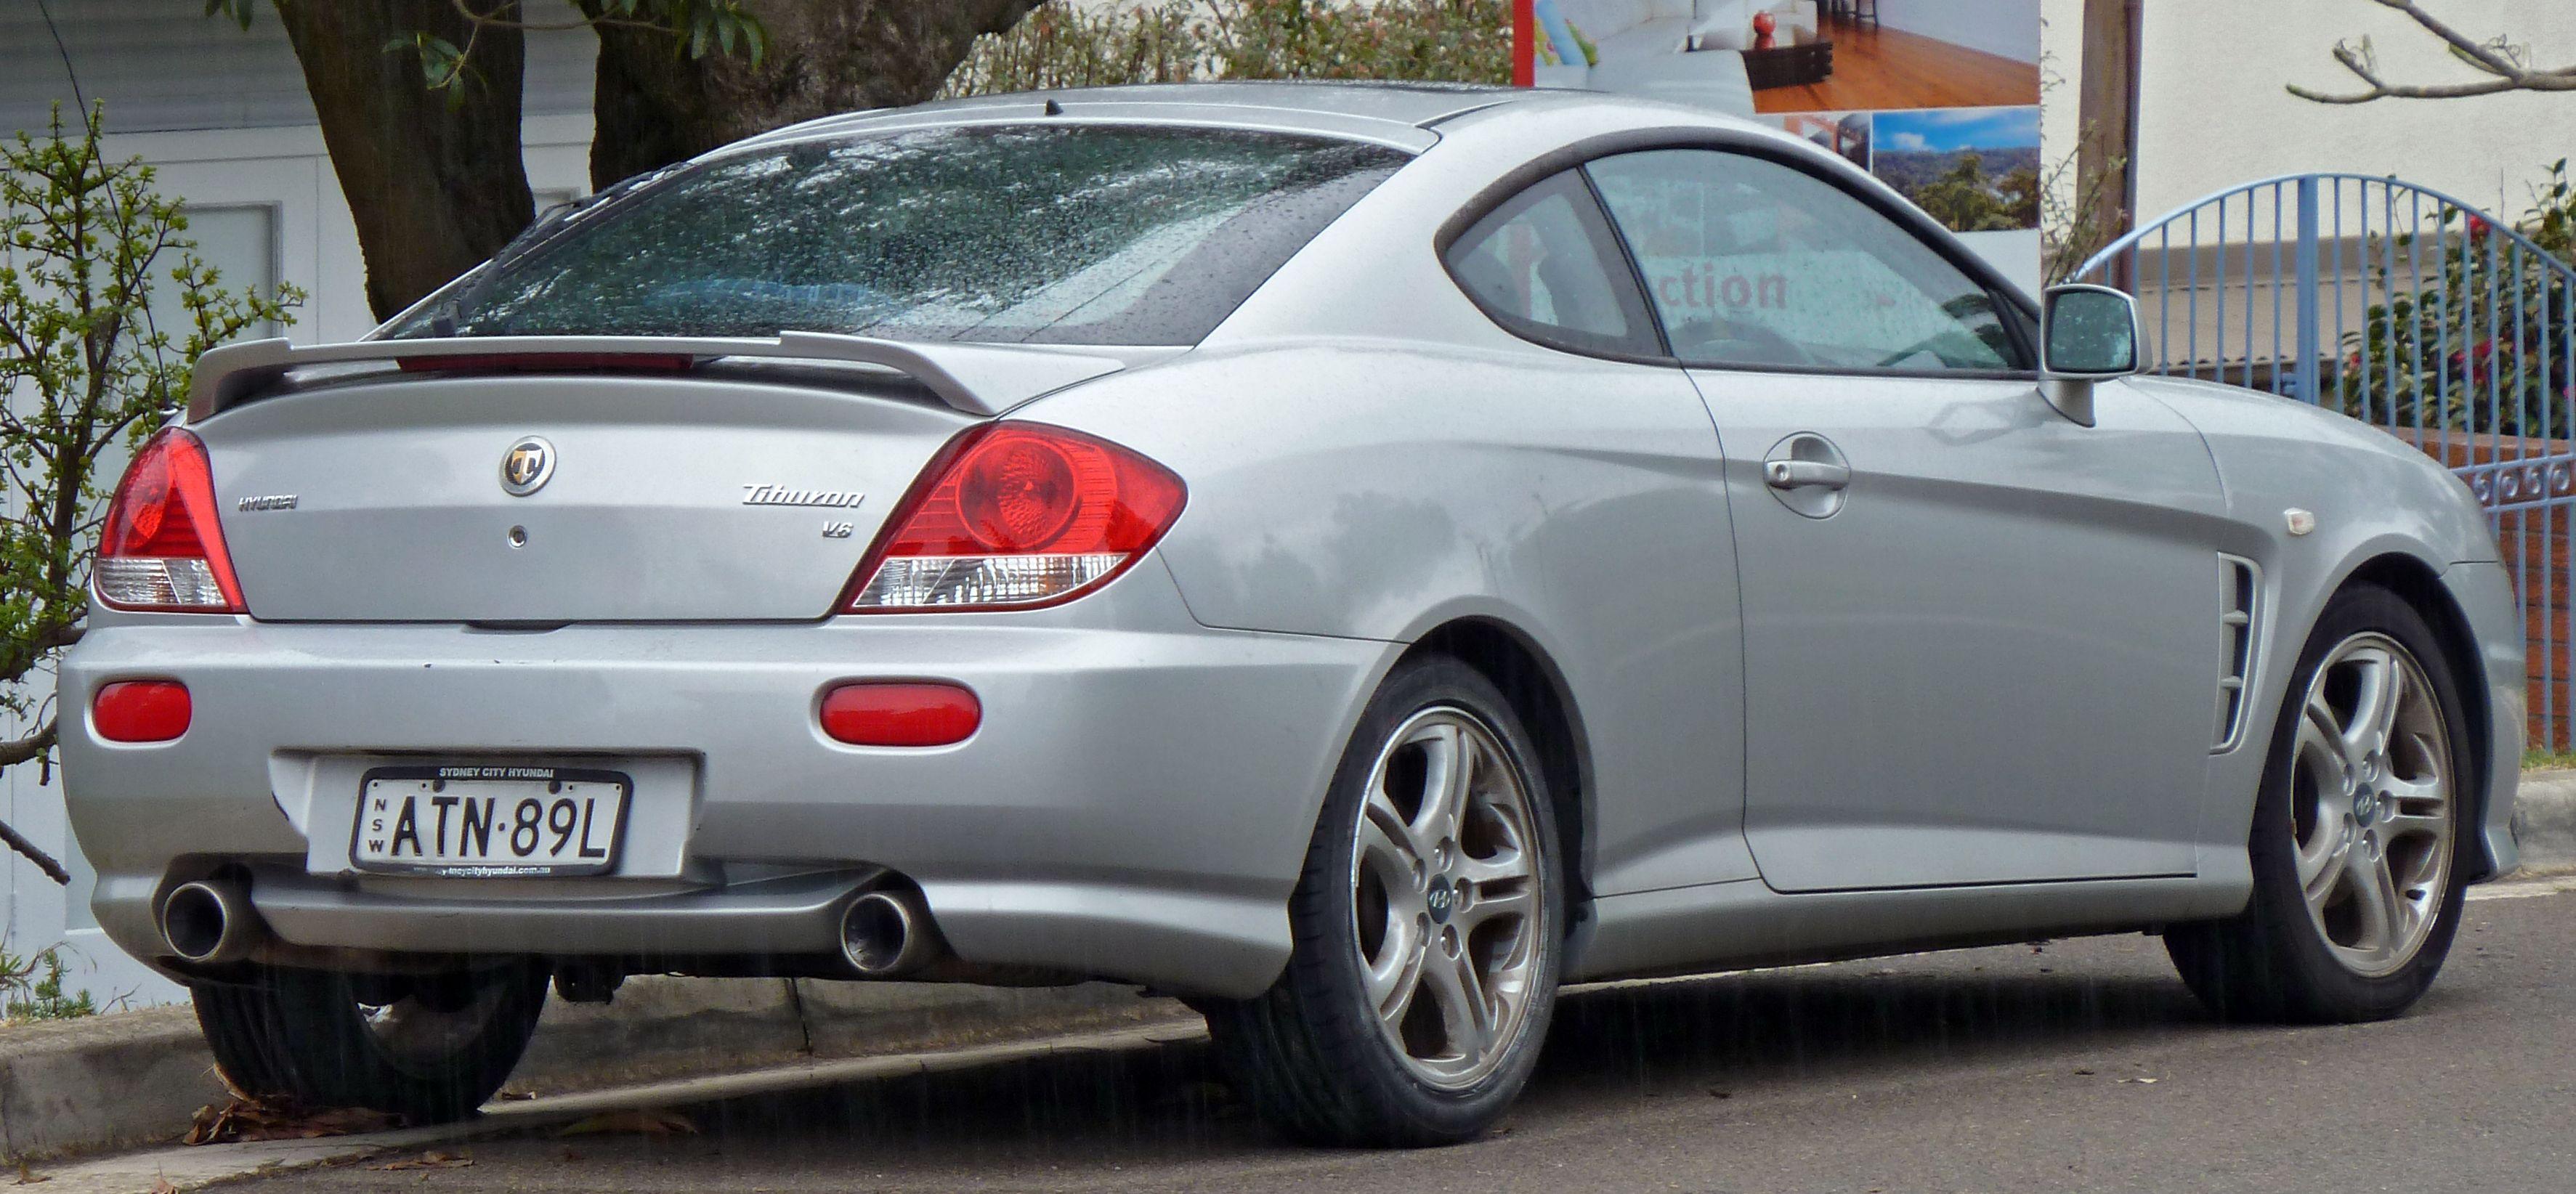 Silver Hyundai Tiburon 130 Hp Hyundai Tiburon Hyundai Silver